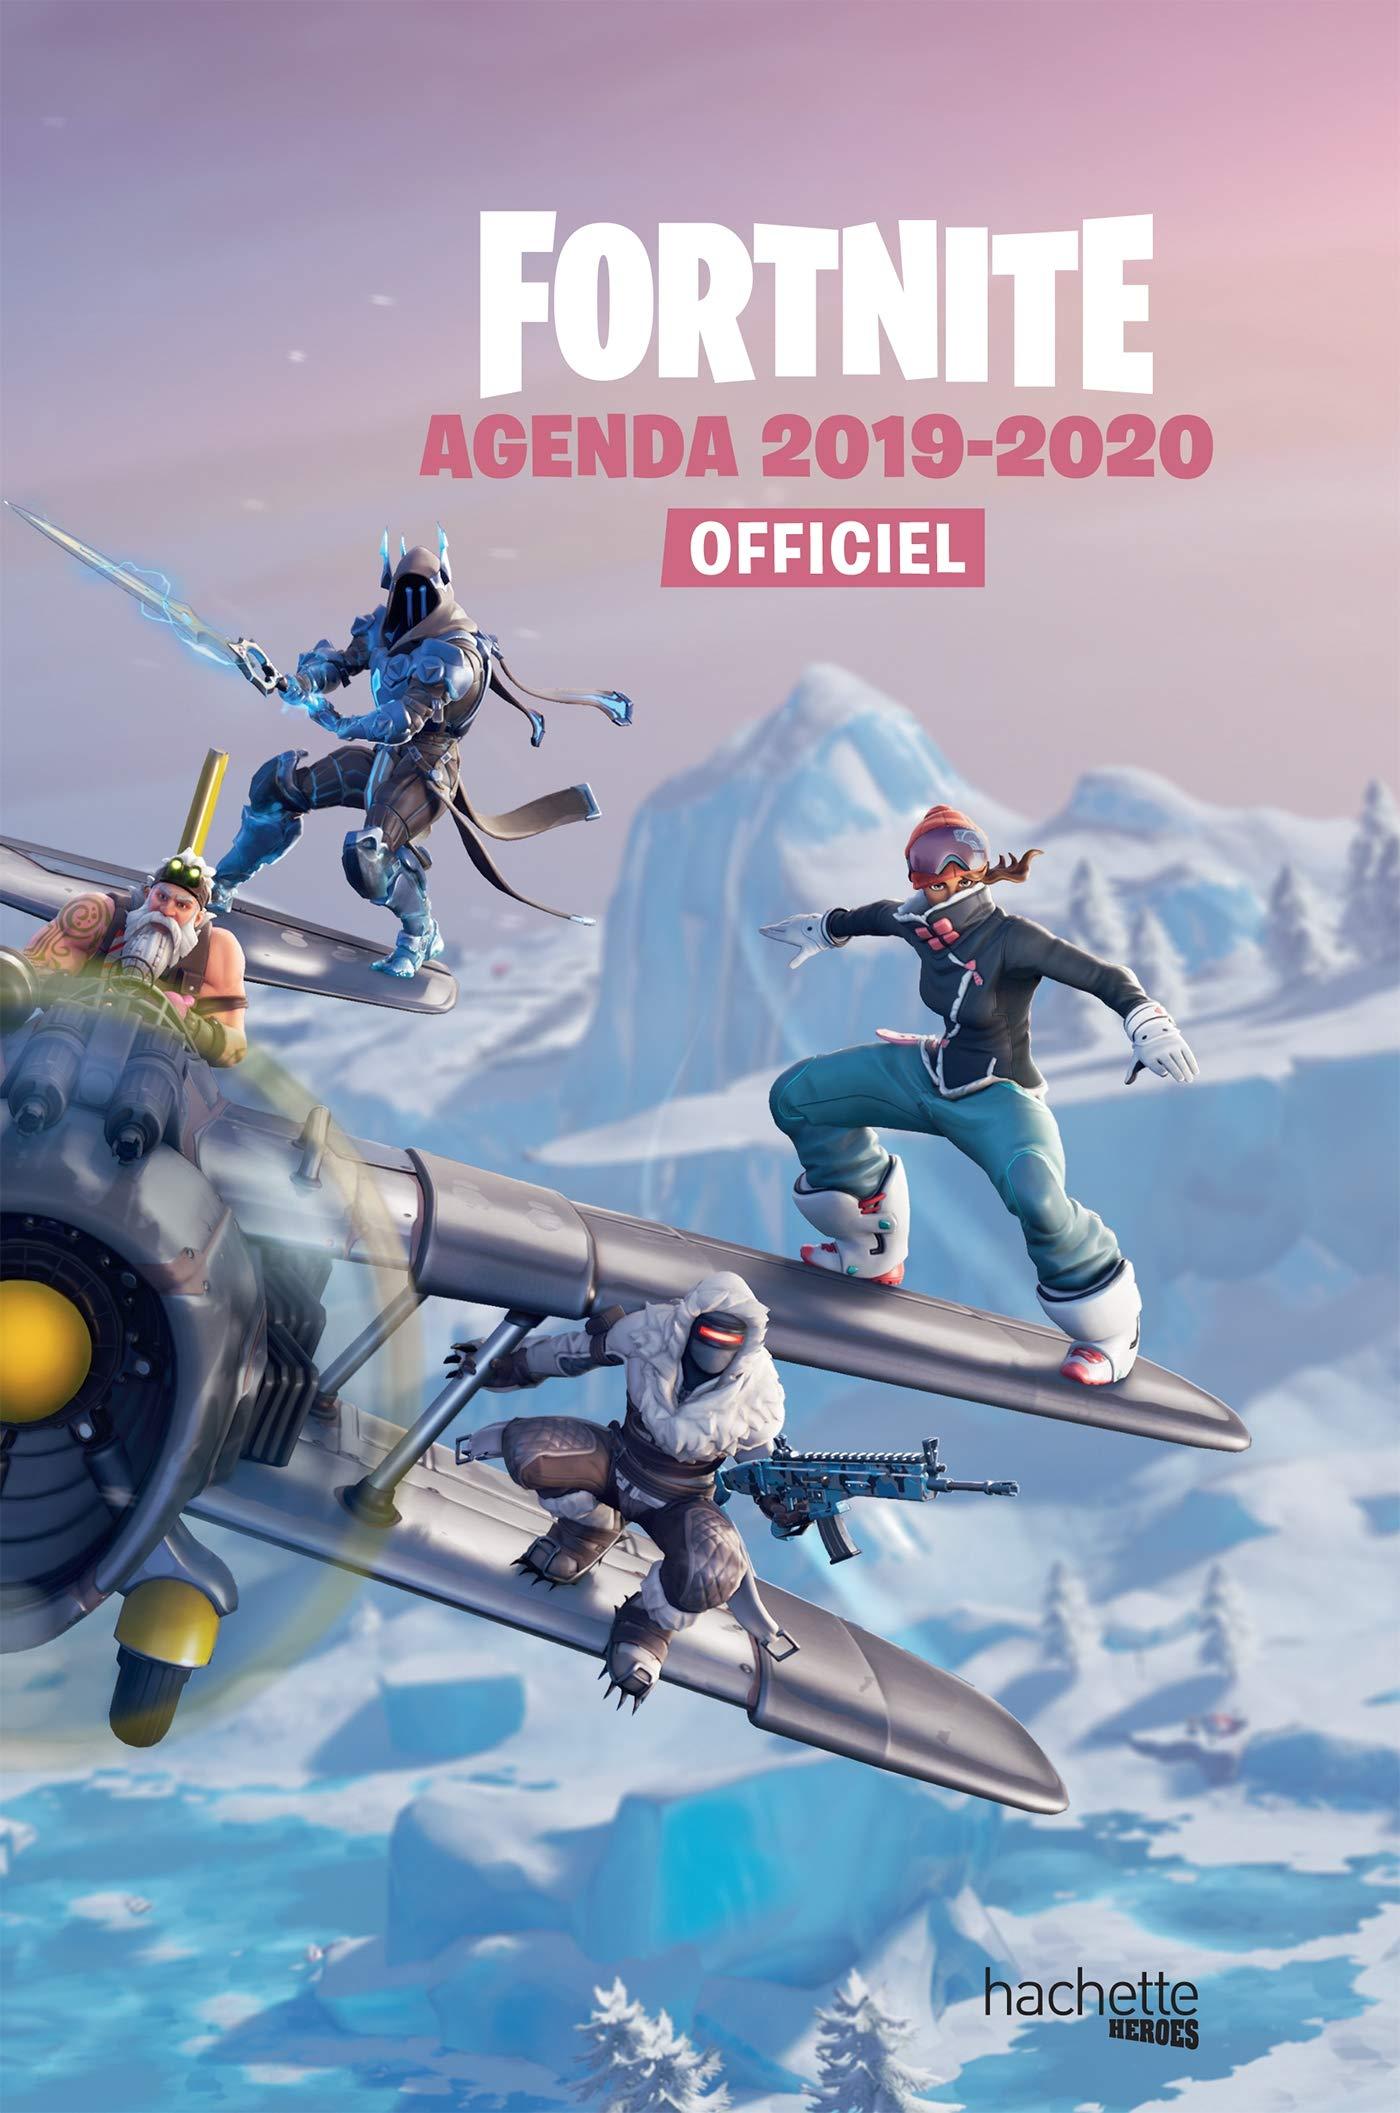 Agenda Fortnite 2019-2020 (Heroes): Amazon.es: Epic Games ...